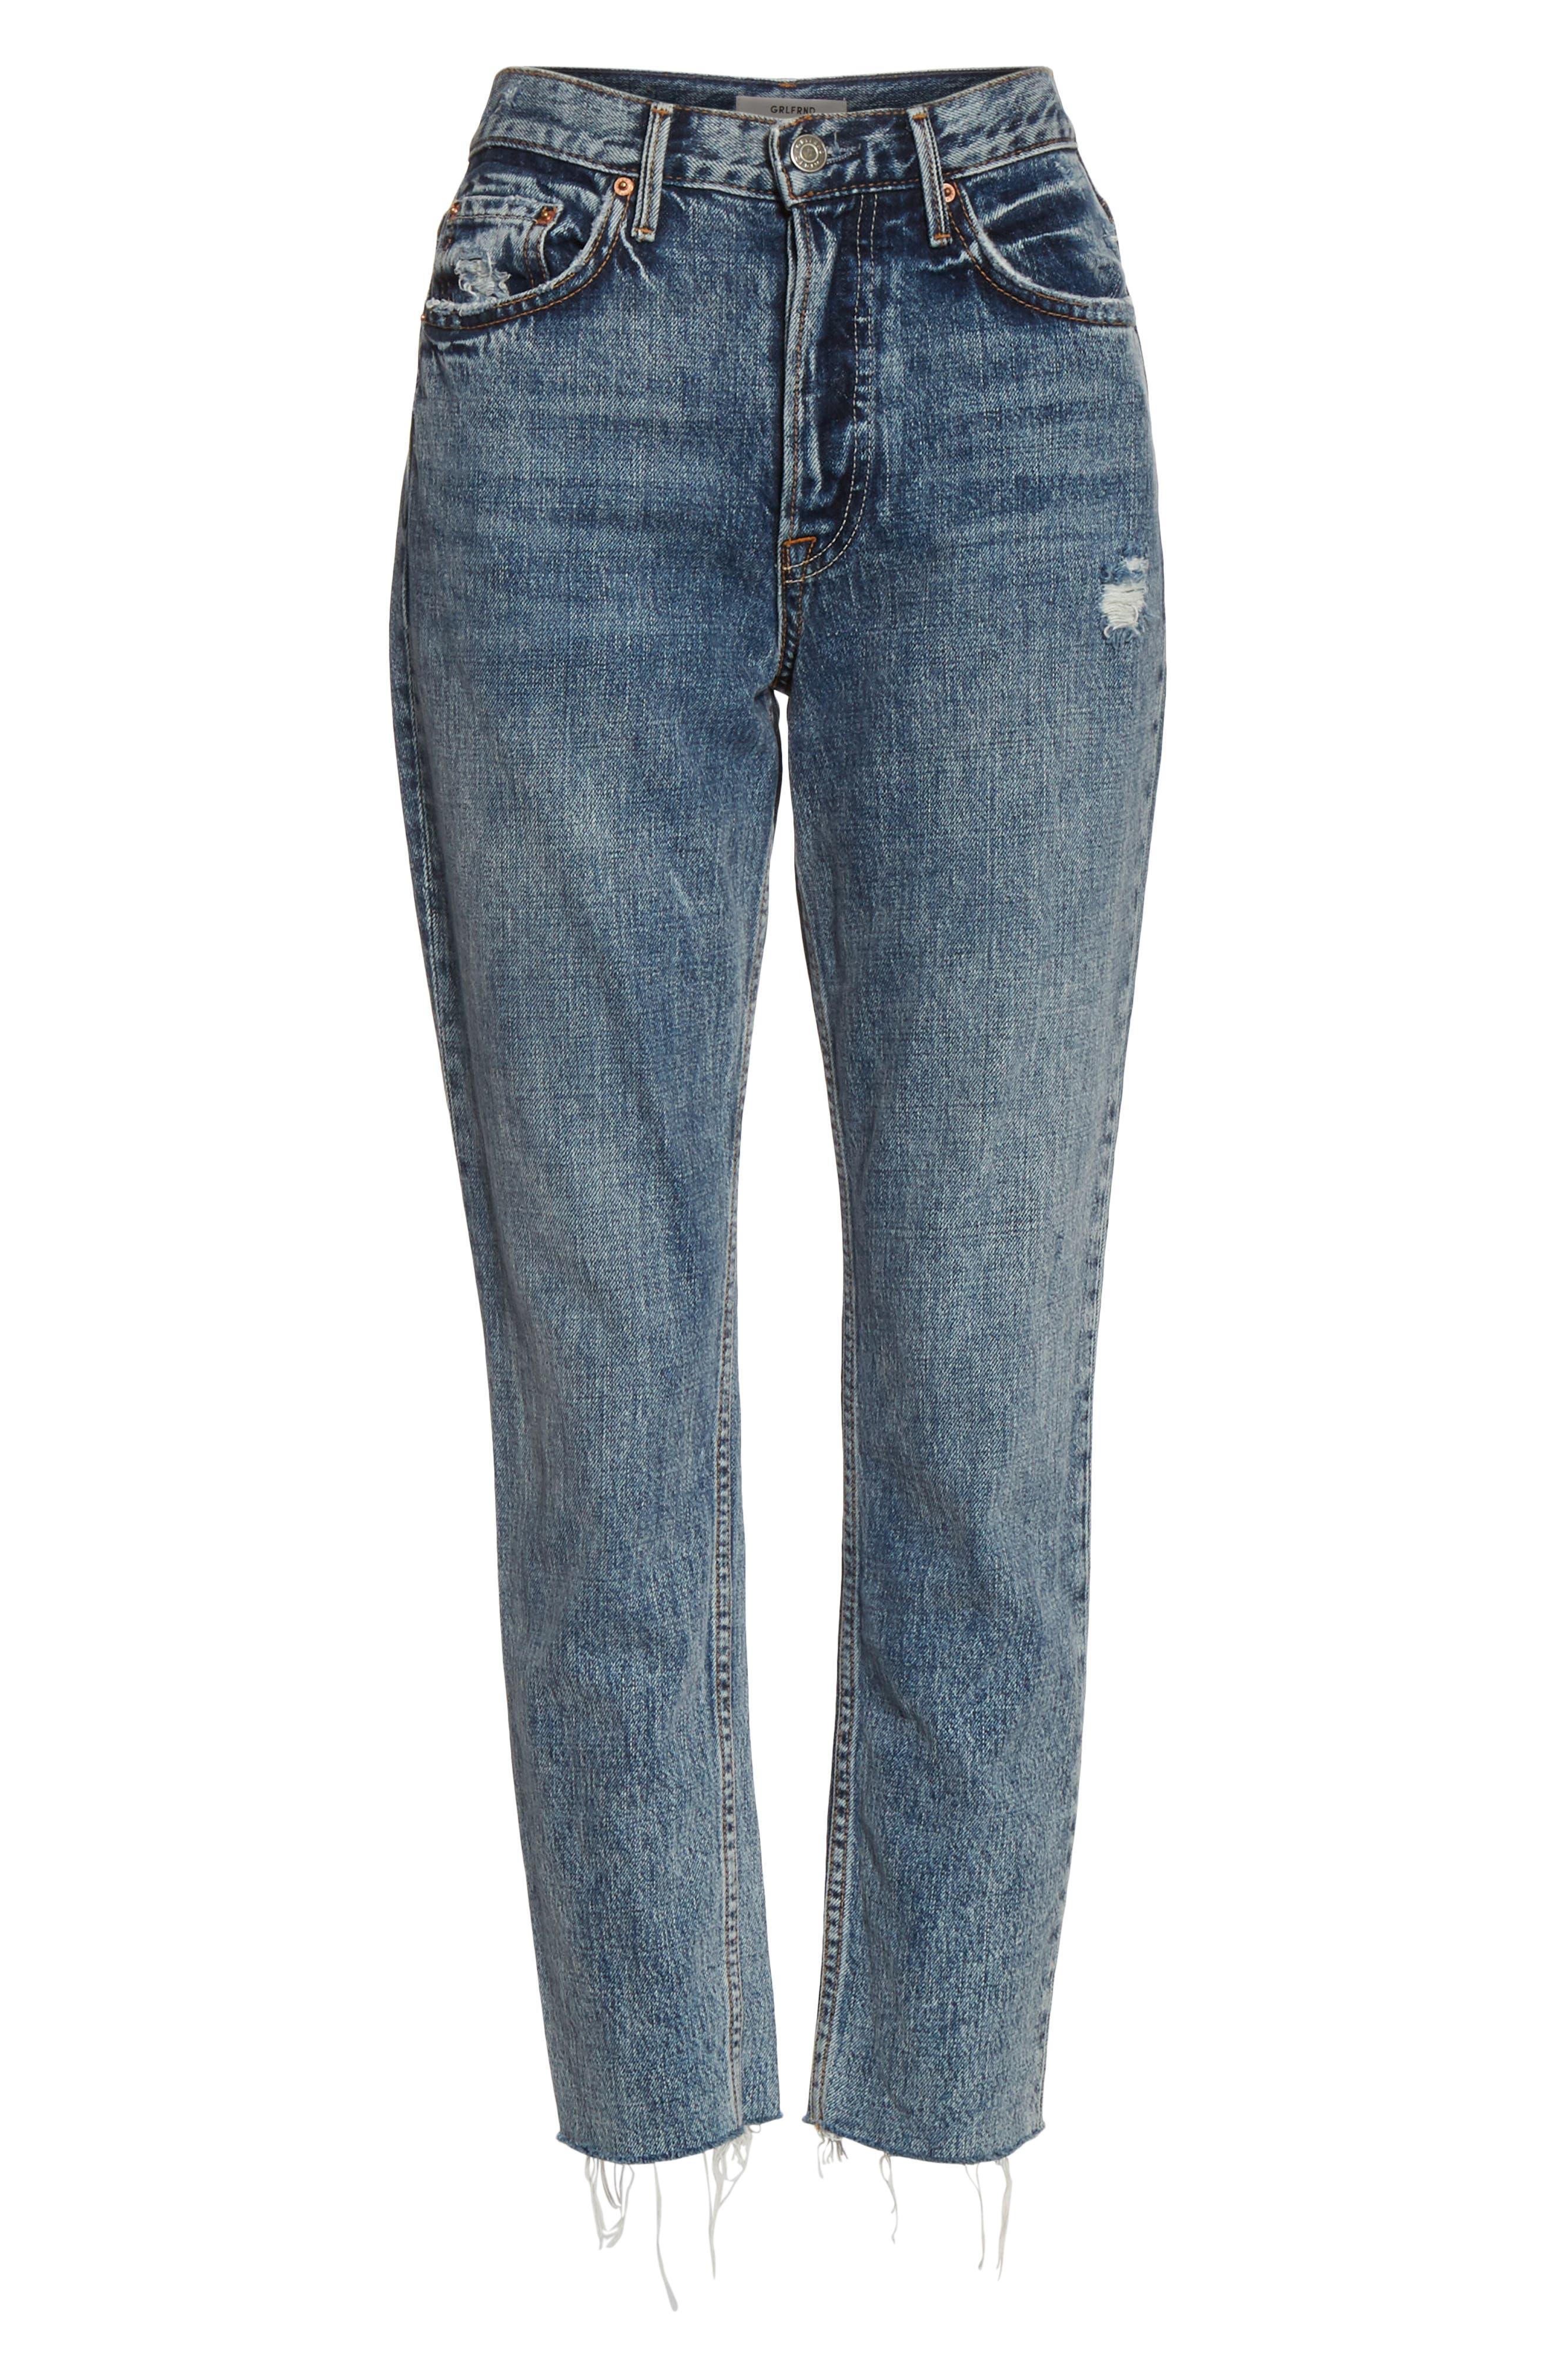 Grlfrnd Jeans Karolina High Waist Skinny Jeans